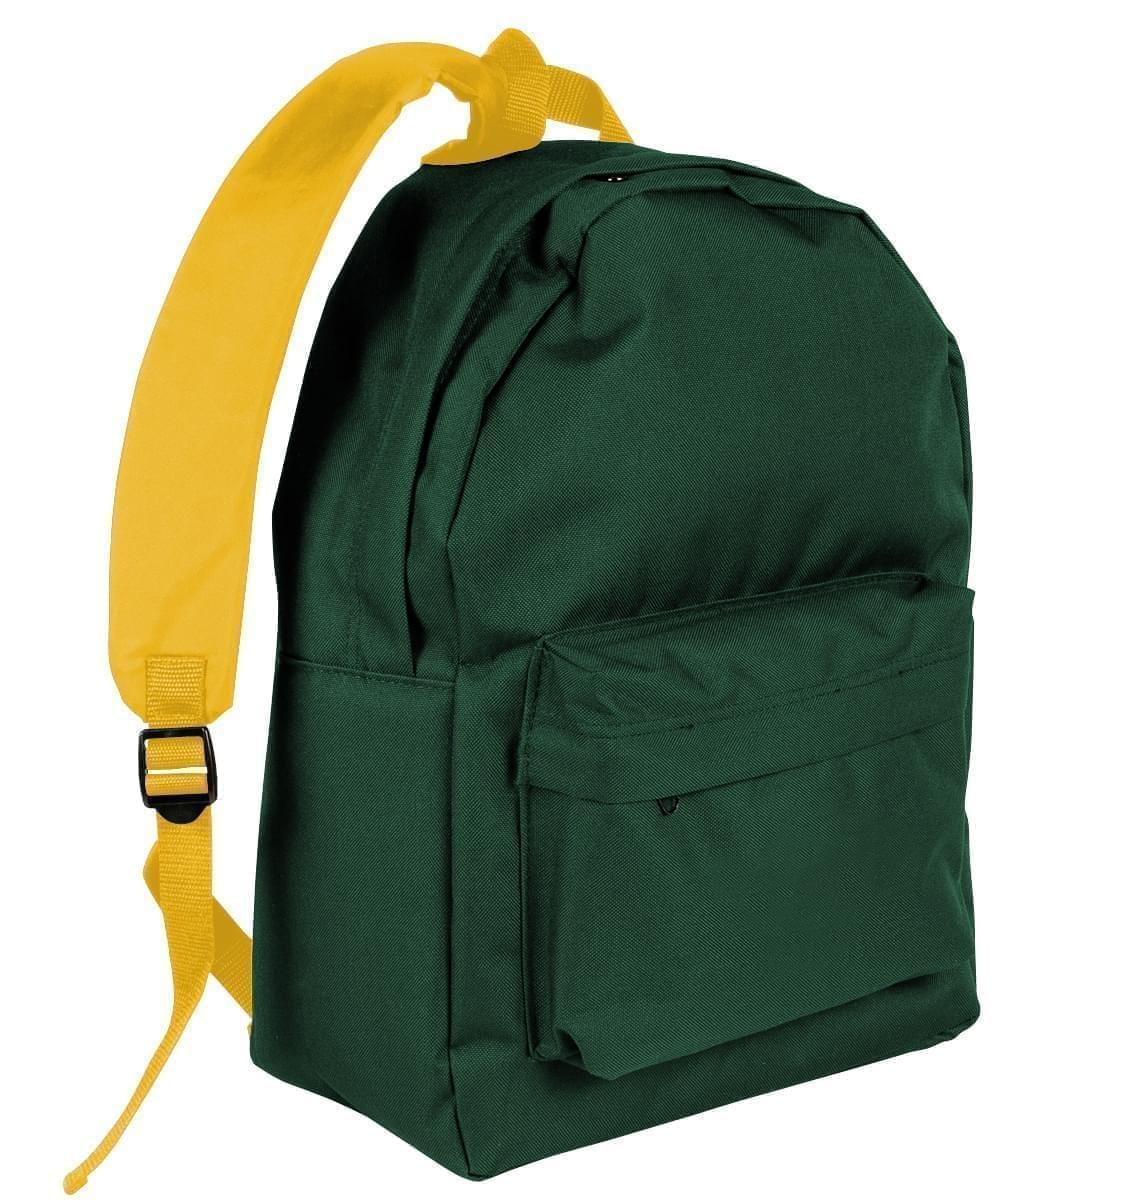 USA Made Nylon Poly Backpack Knapsacks, Hunter Green-Gold, 8960-AS5